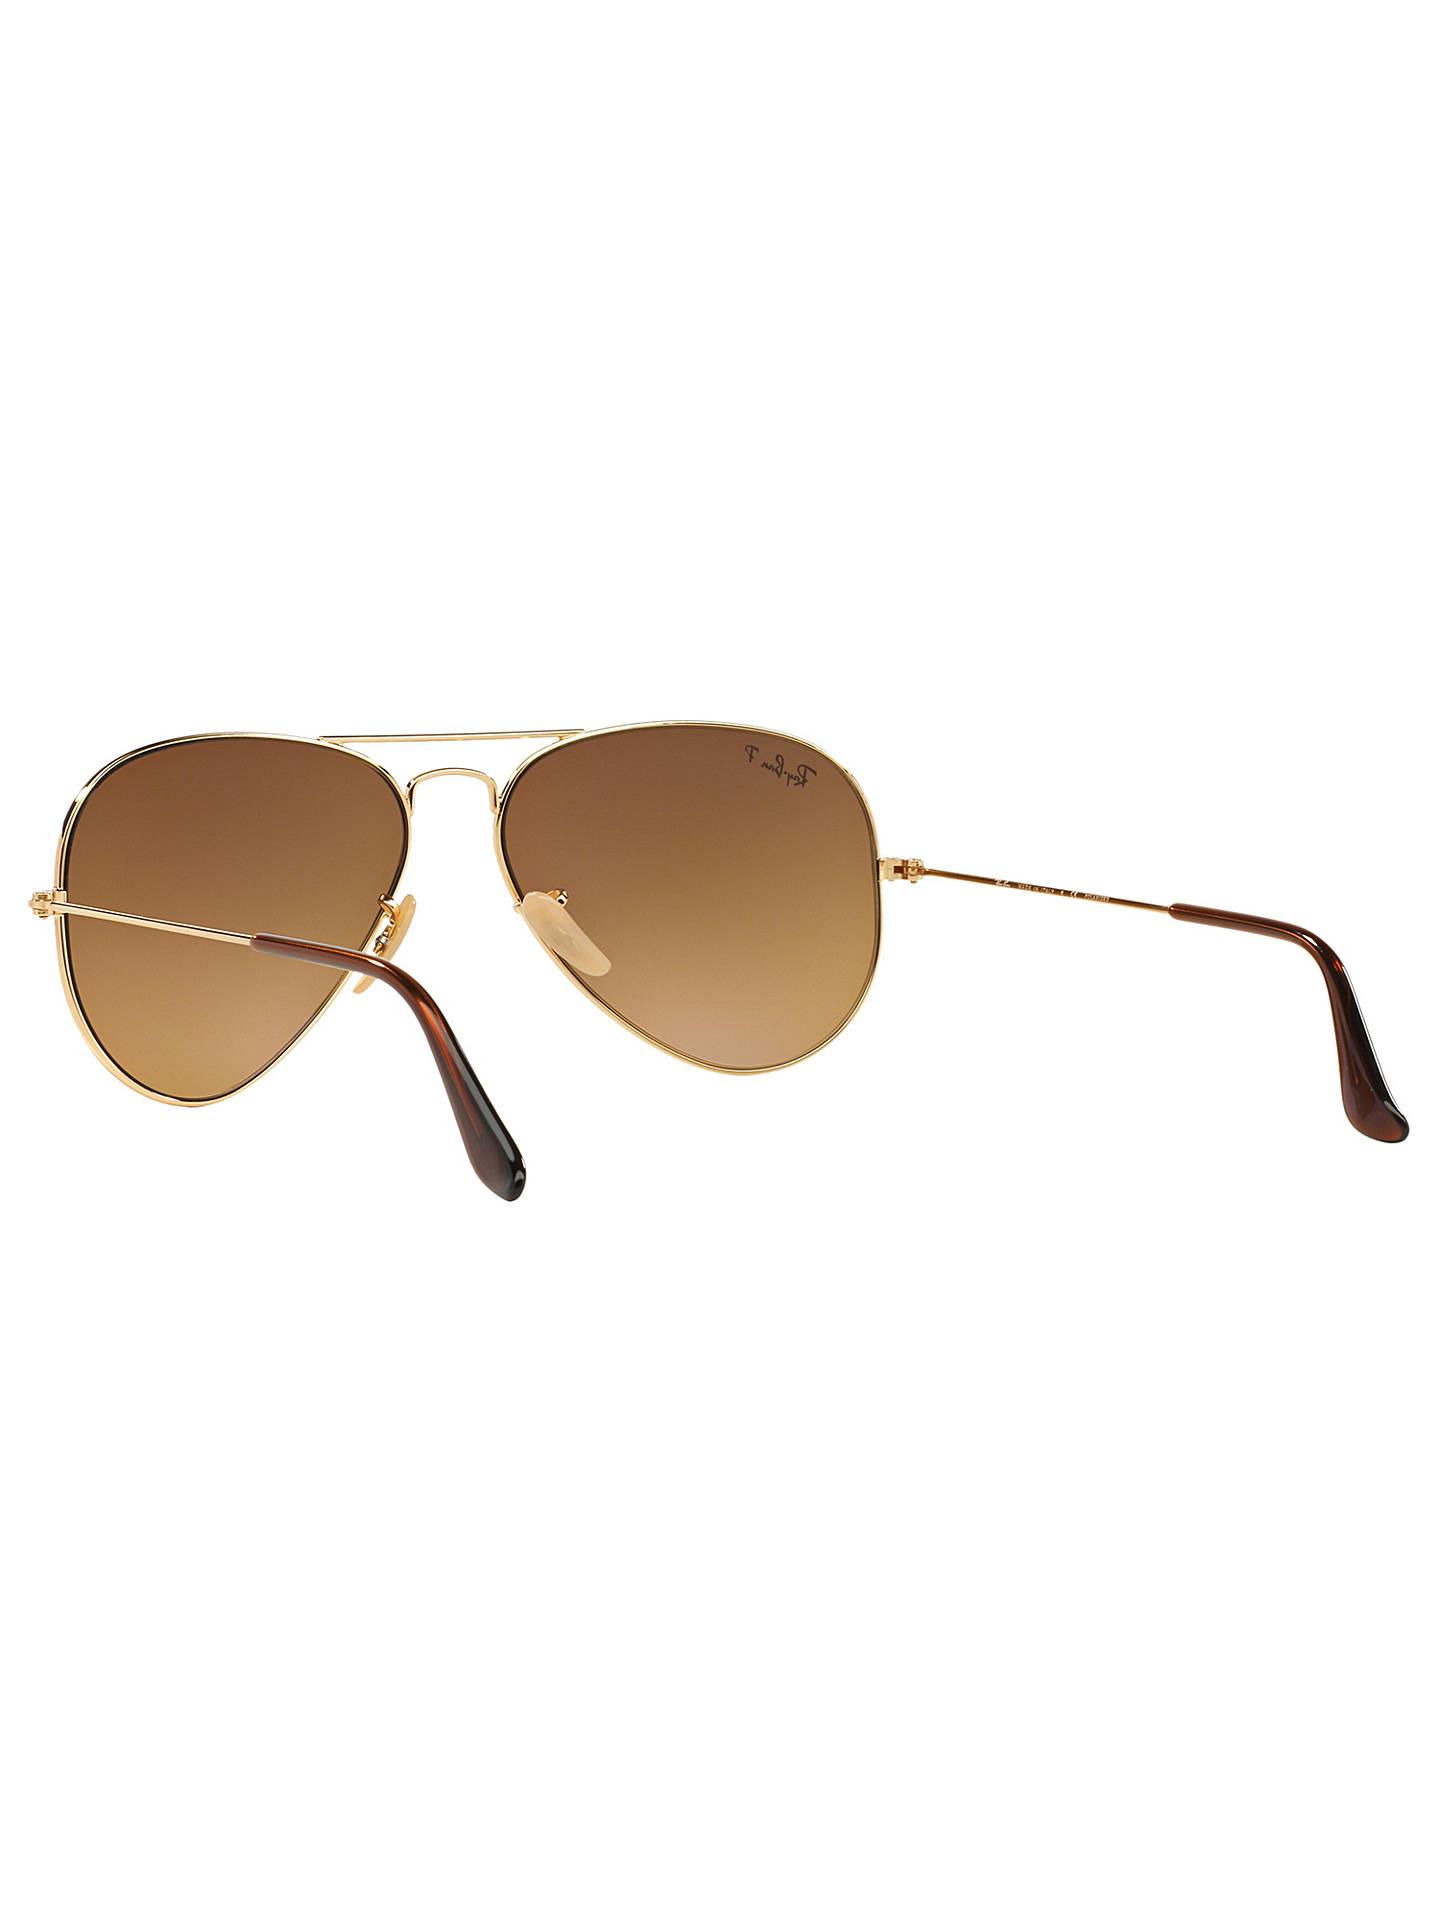 94f954b09f ... Buy Ray-Ban RB3025 Polarised Aviator Sunglasses